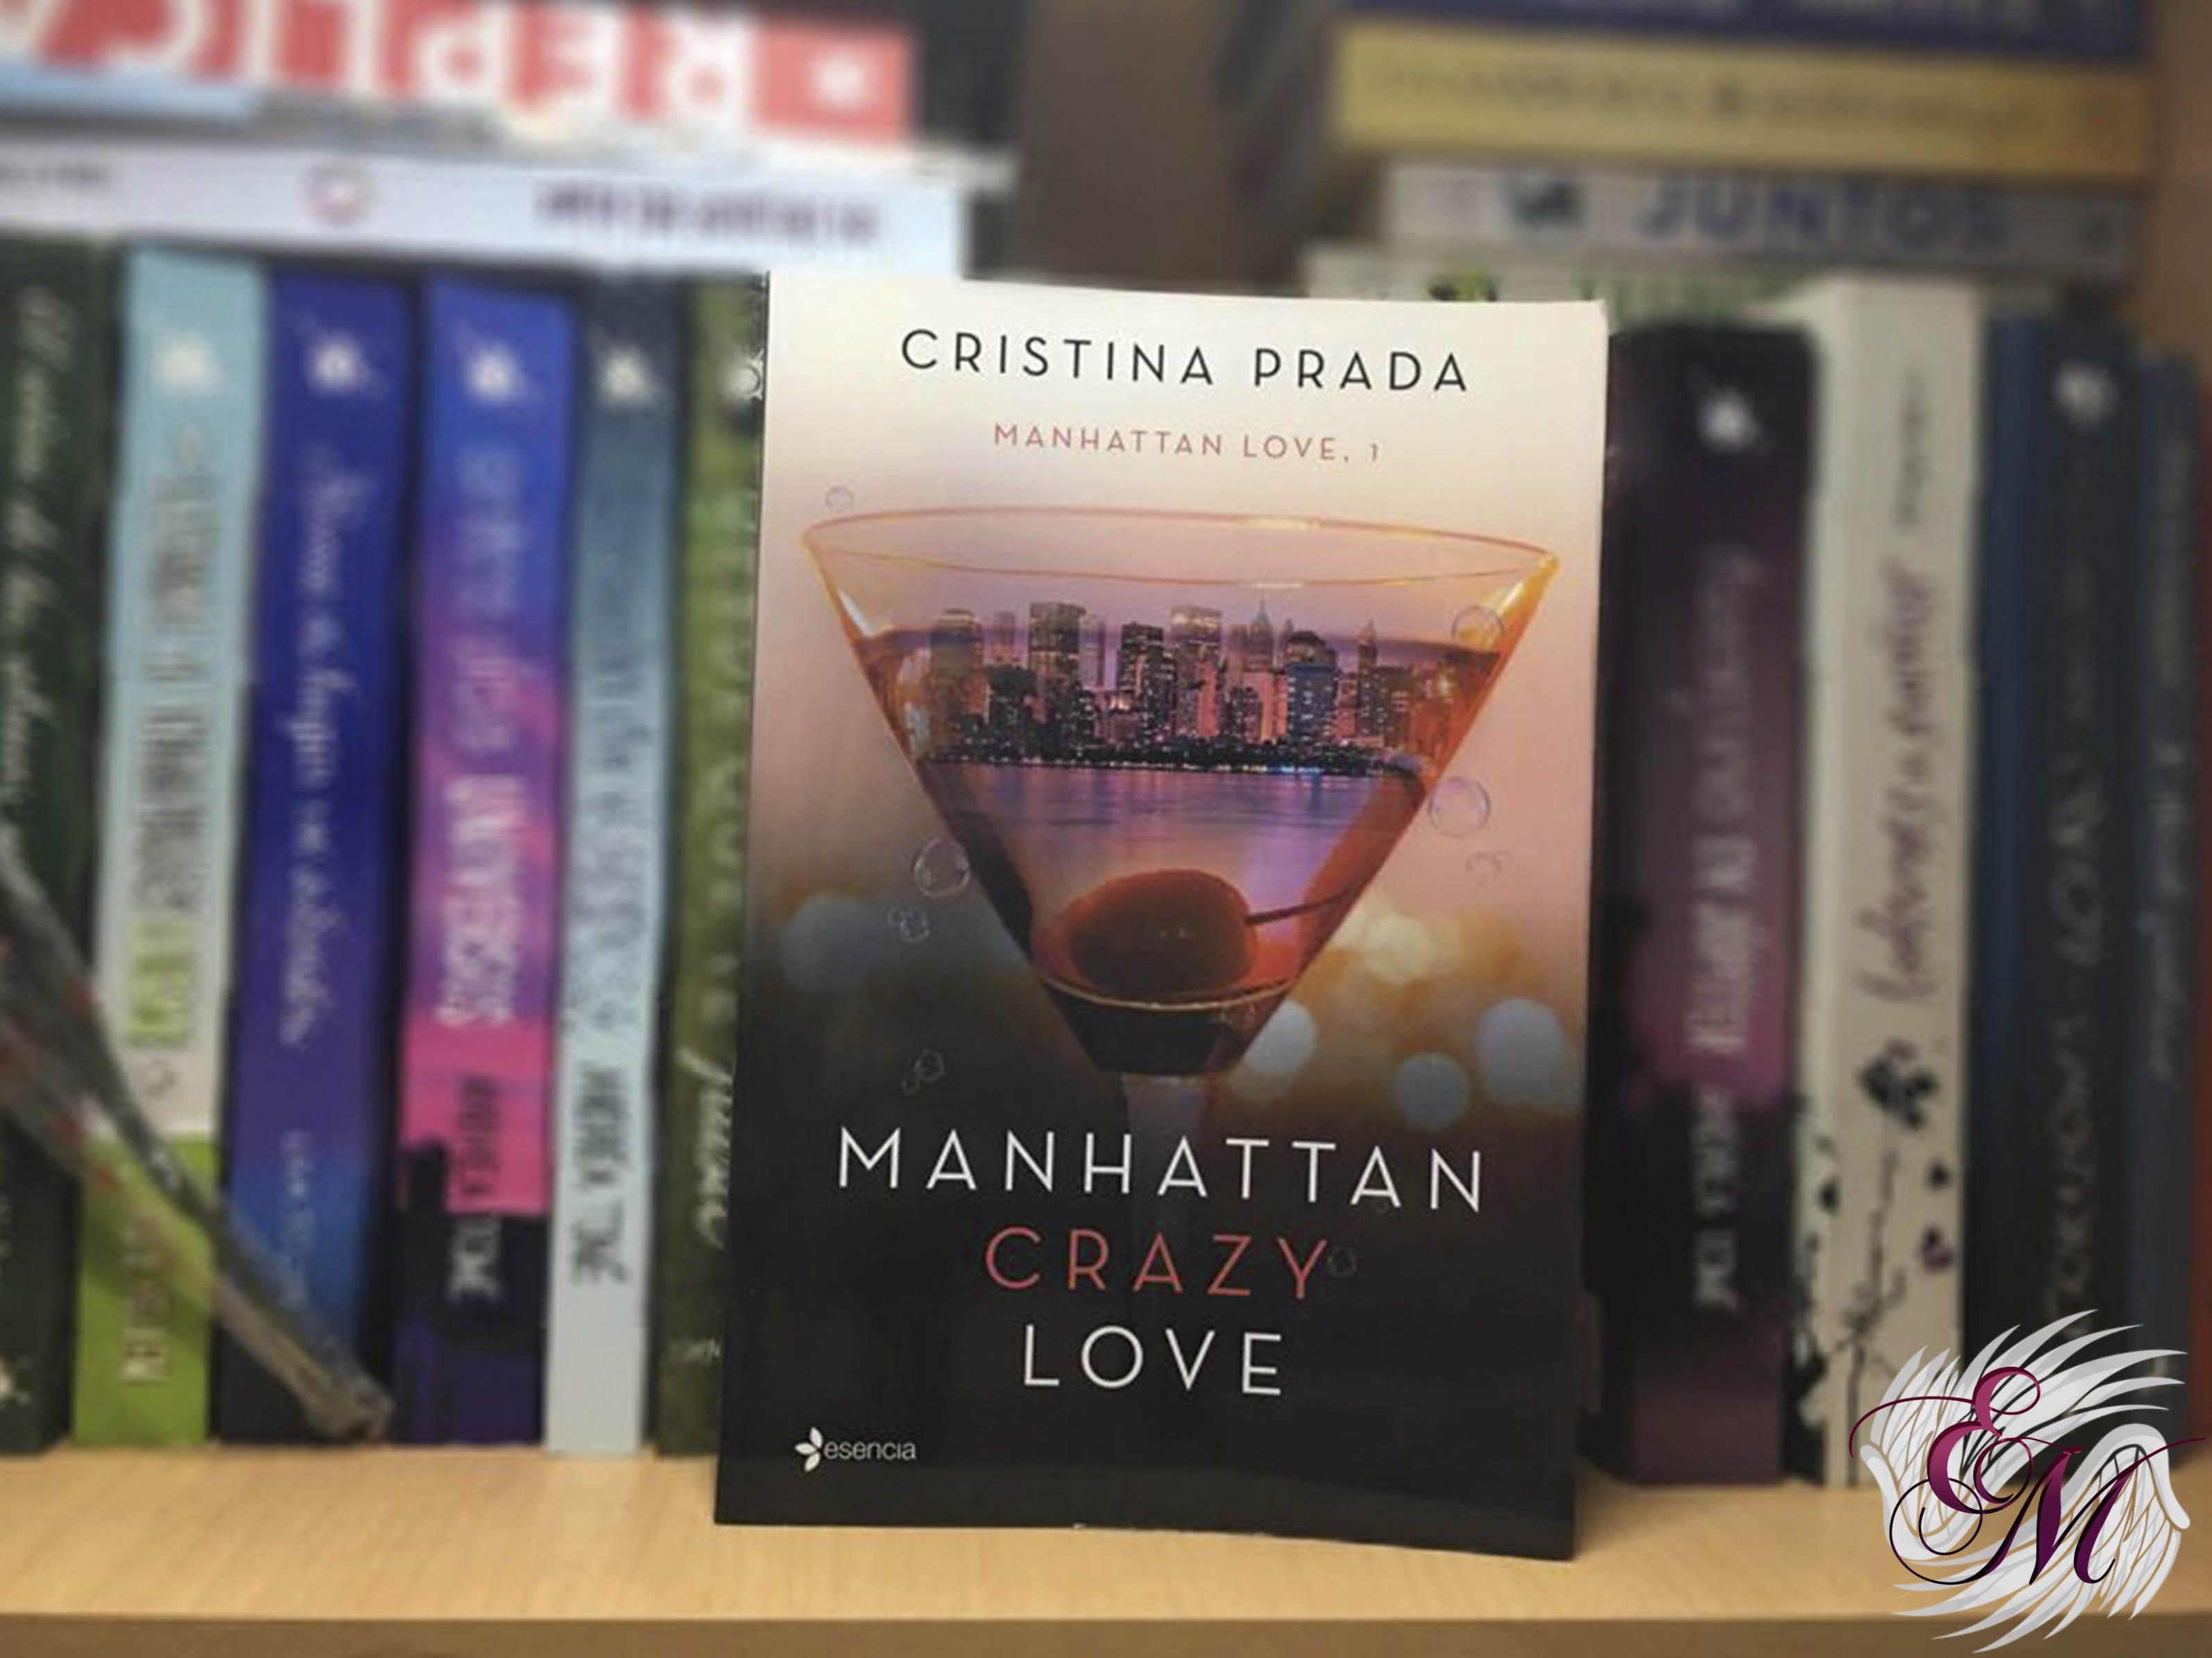 Manhattan crazy love, de Cristina Prada - Reseña